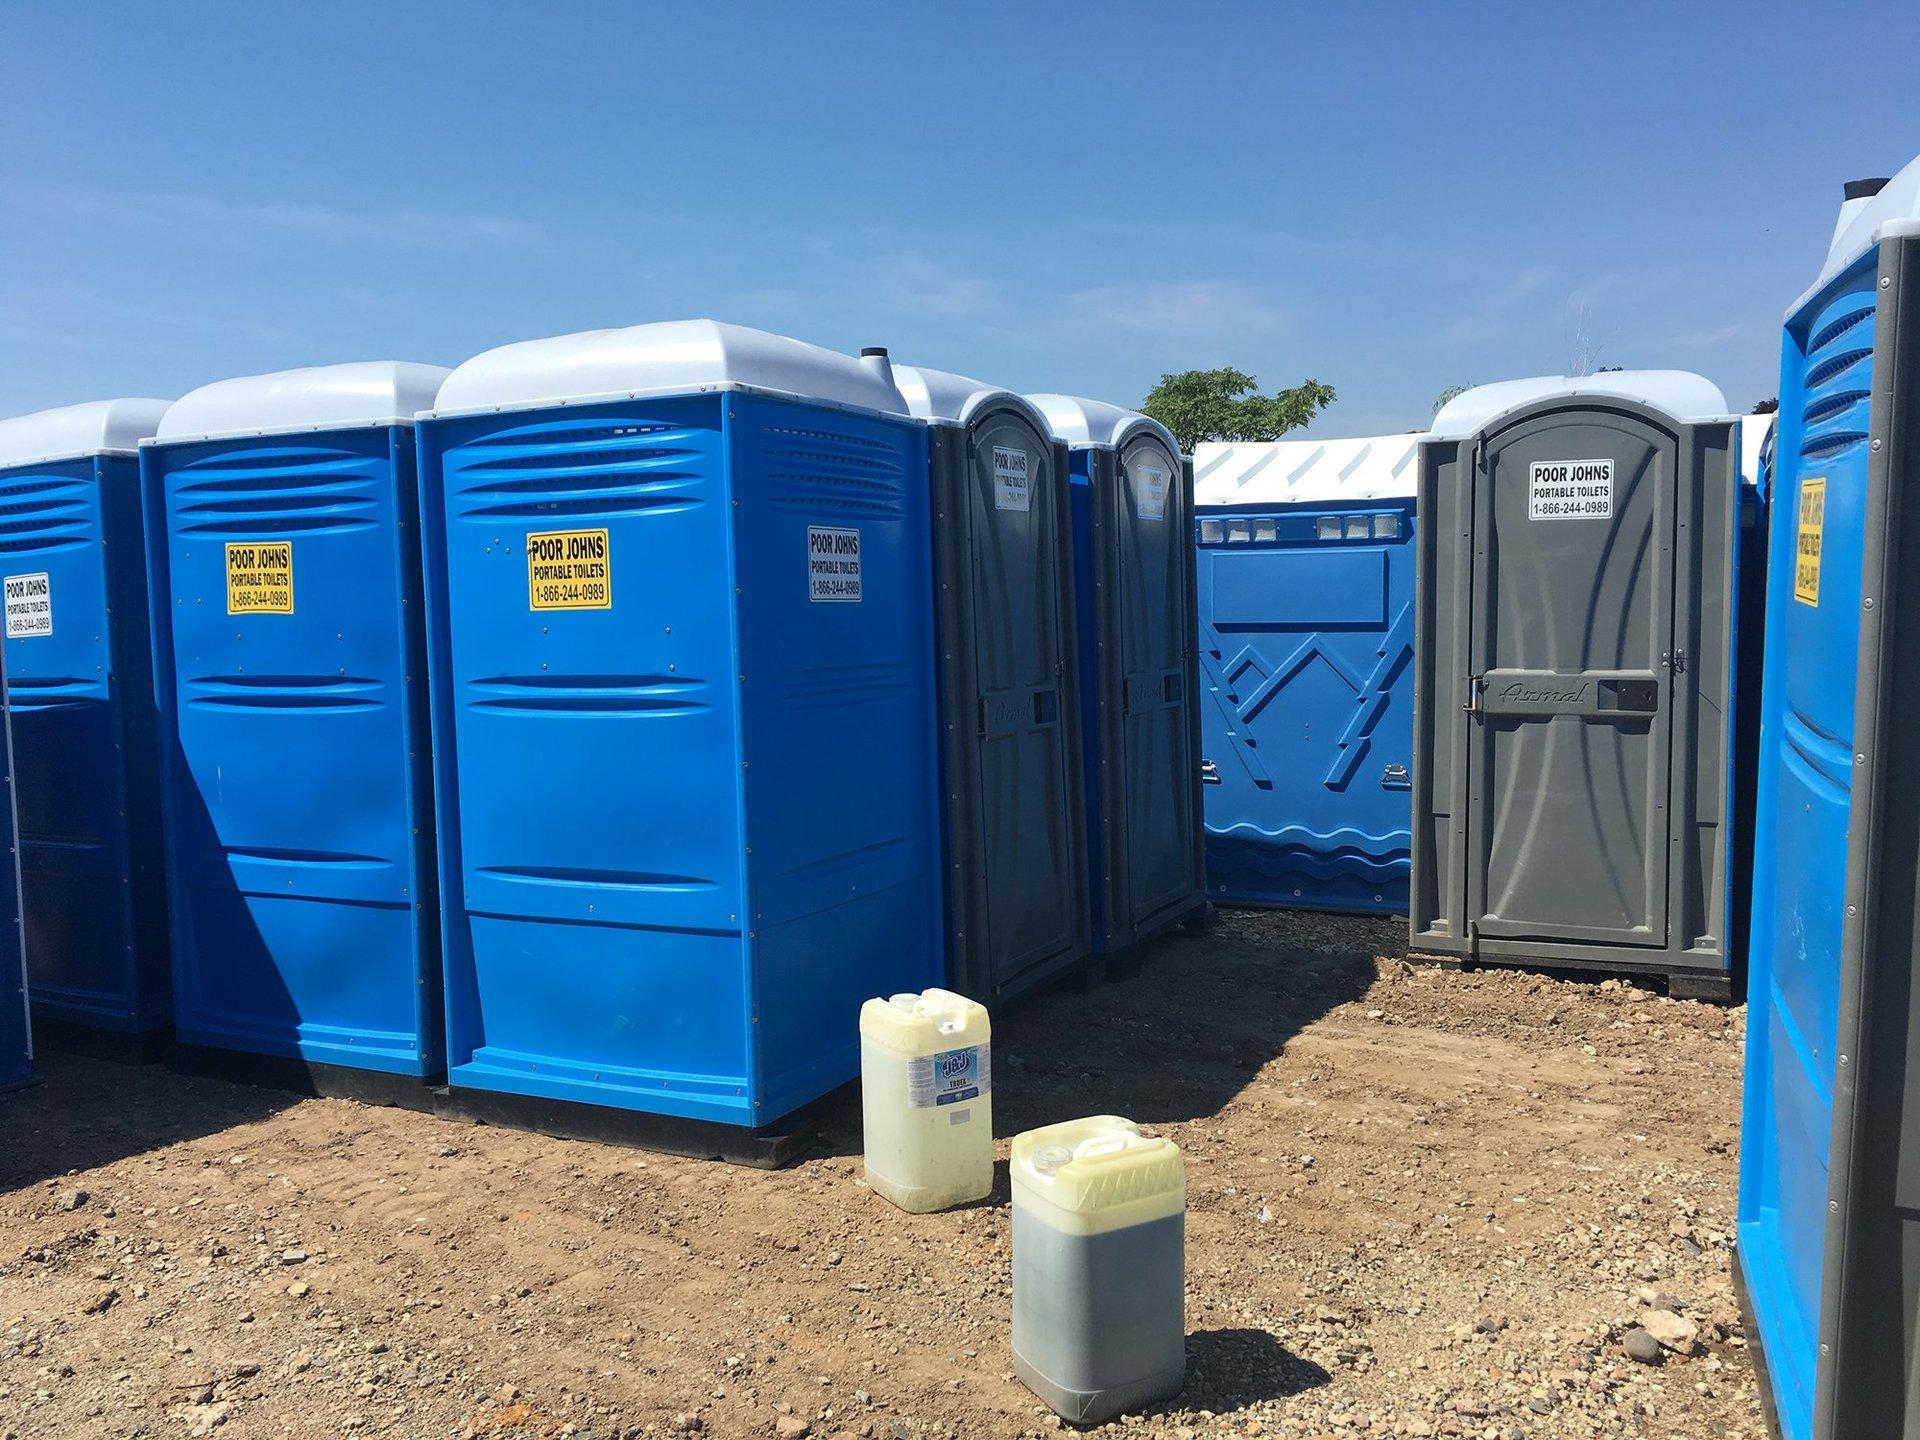 Poor John's Portable Toilets image 4